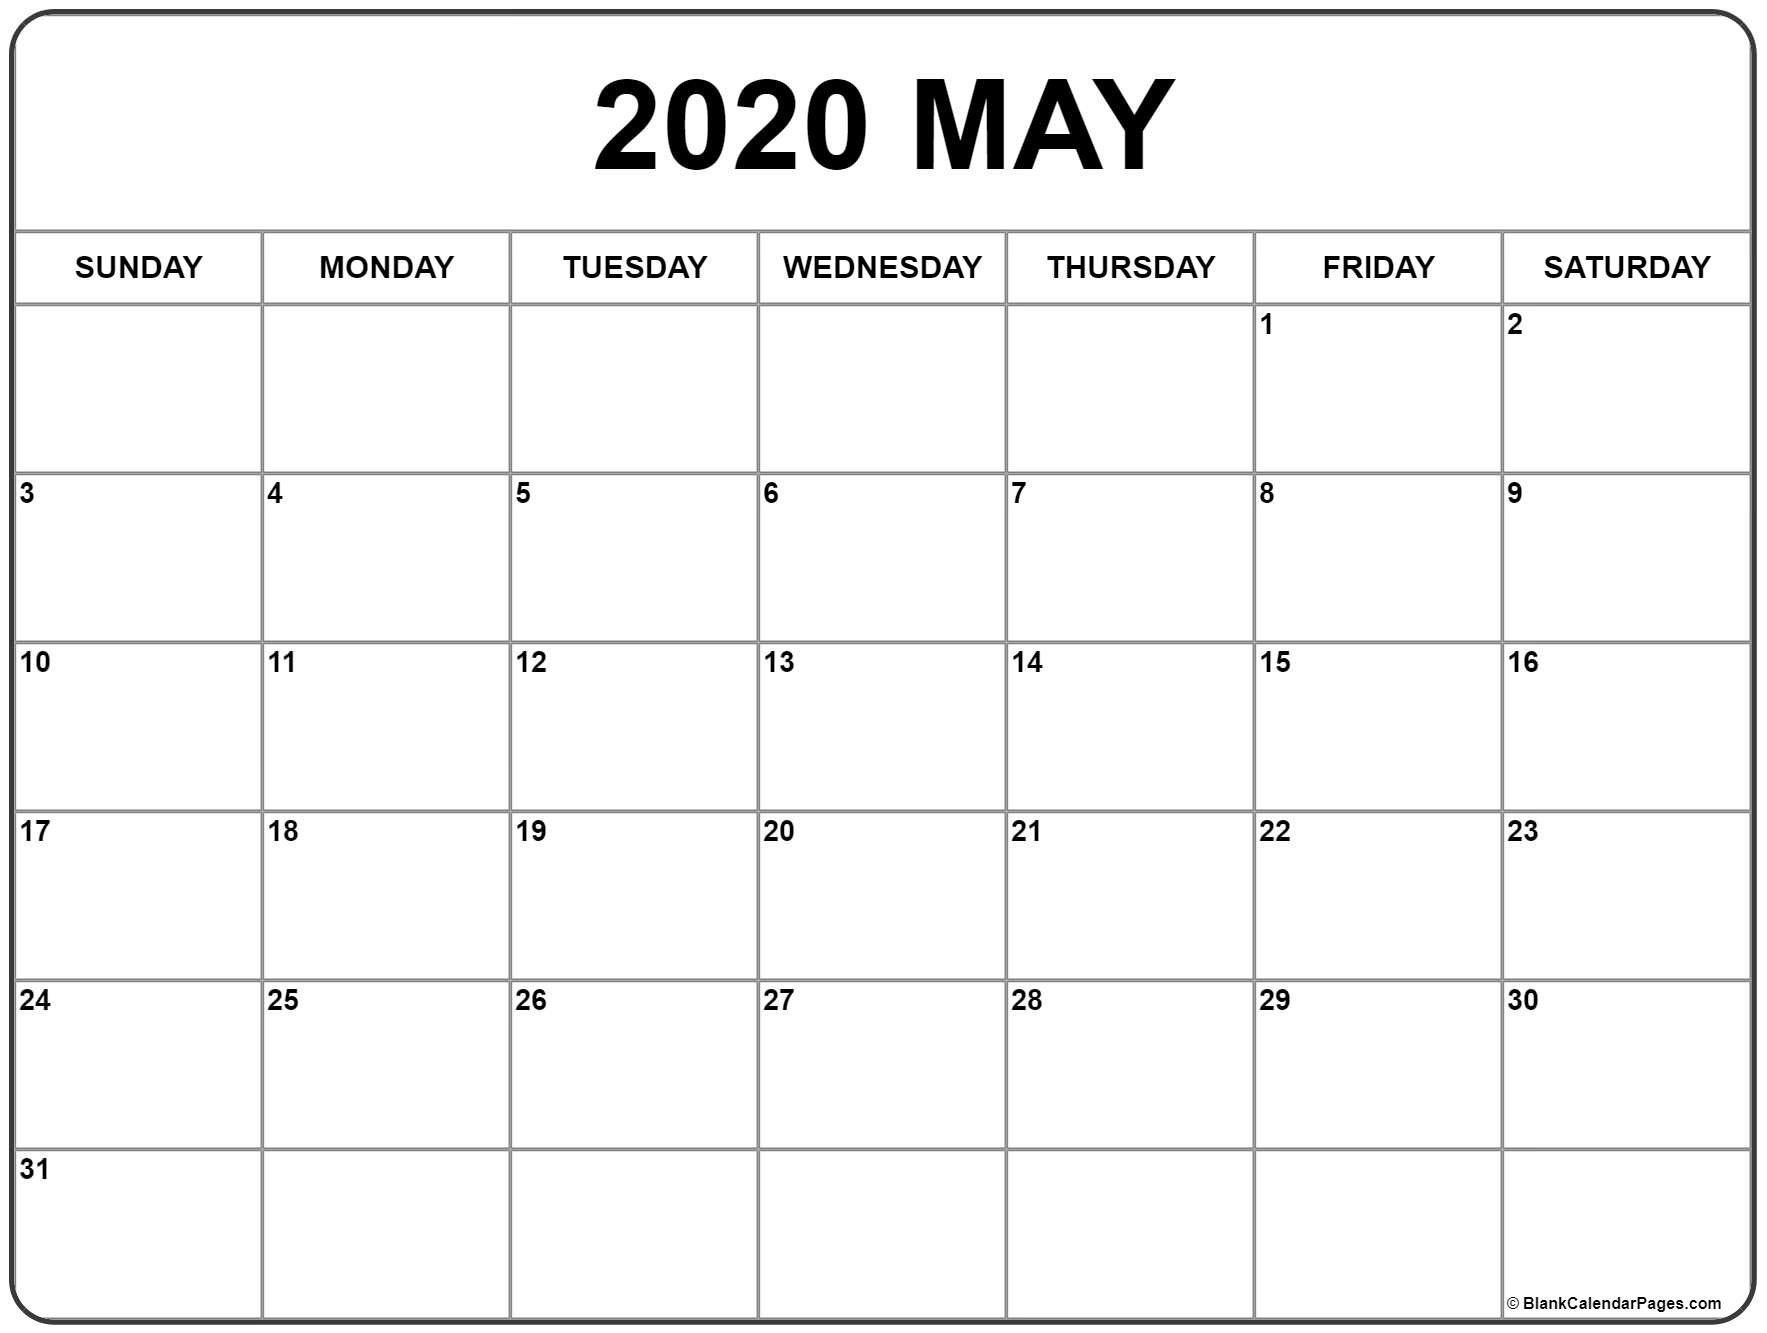 Blank May 2020 Calendar Printable Beta Calendars May 2020 pertaining to December 2020 Calendar Beta Calendars